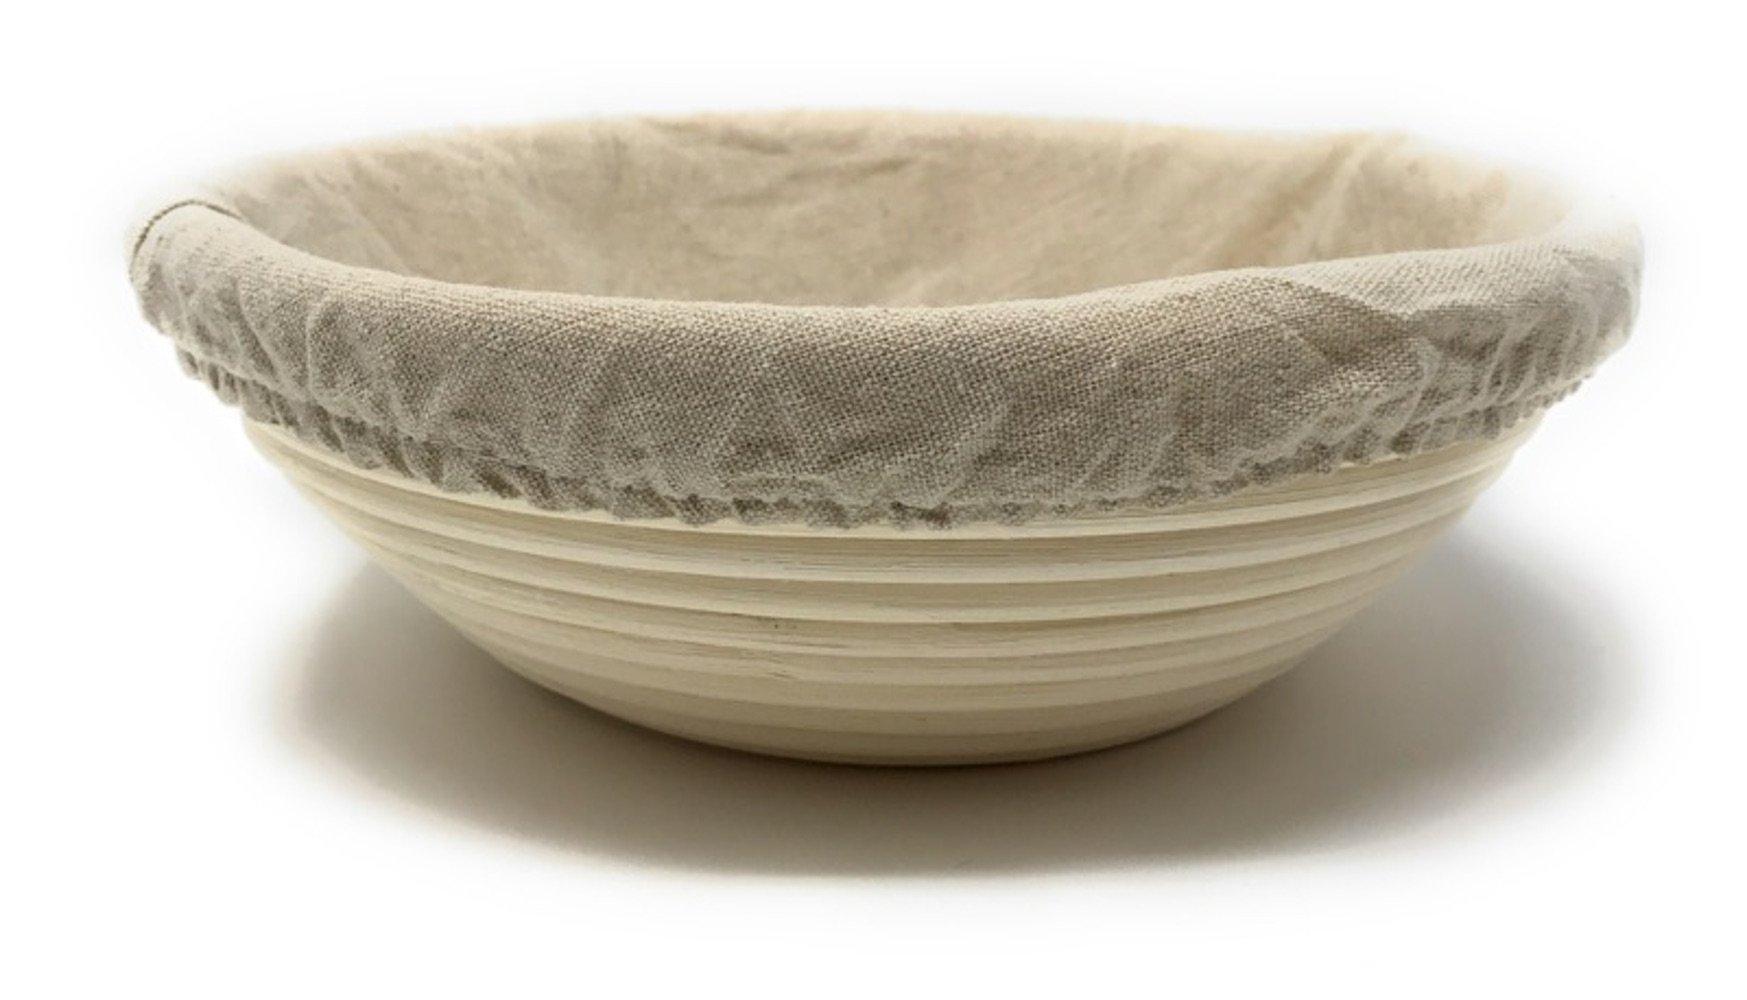 3-Piece Set: Emile Henry Ceramic Round Stewpot Dutch Oven Bread Pot, Burgundy, 8 inch Round Banneton Bread Rising Basket, Fitted Cotton Liner - Bundle by Bundle (Image #2)